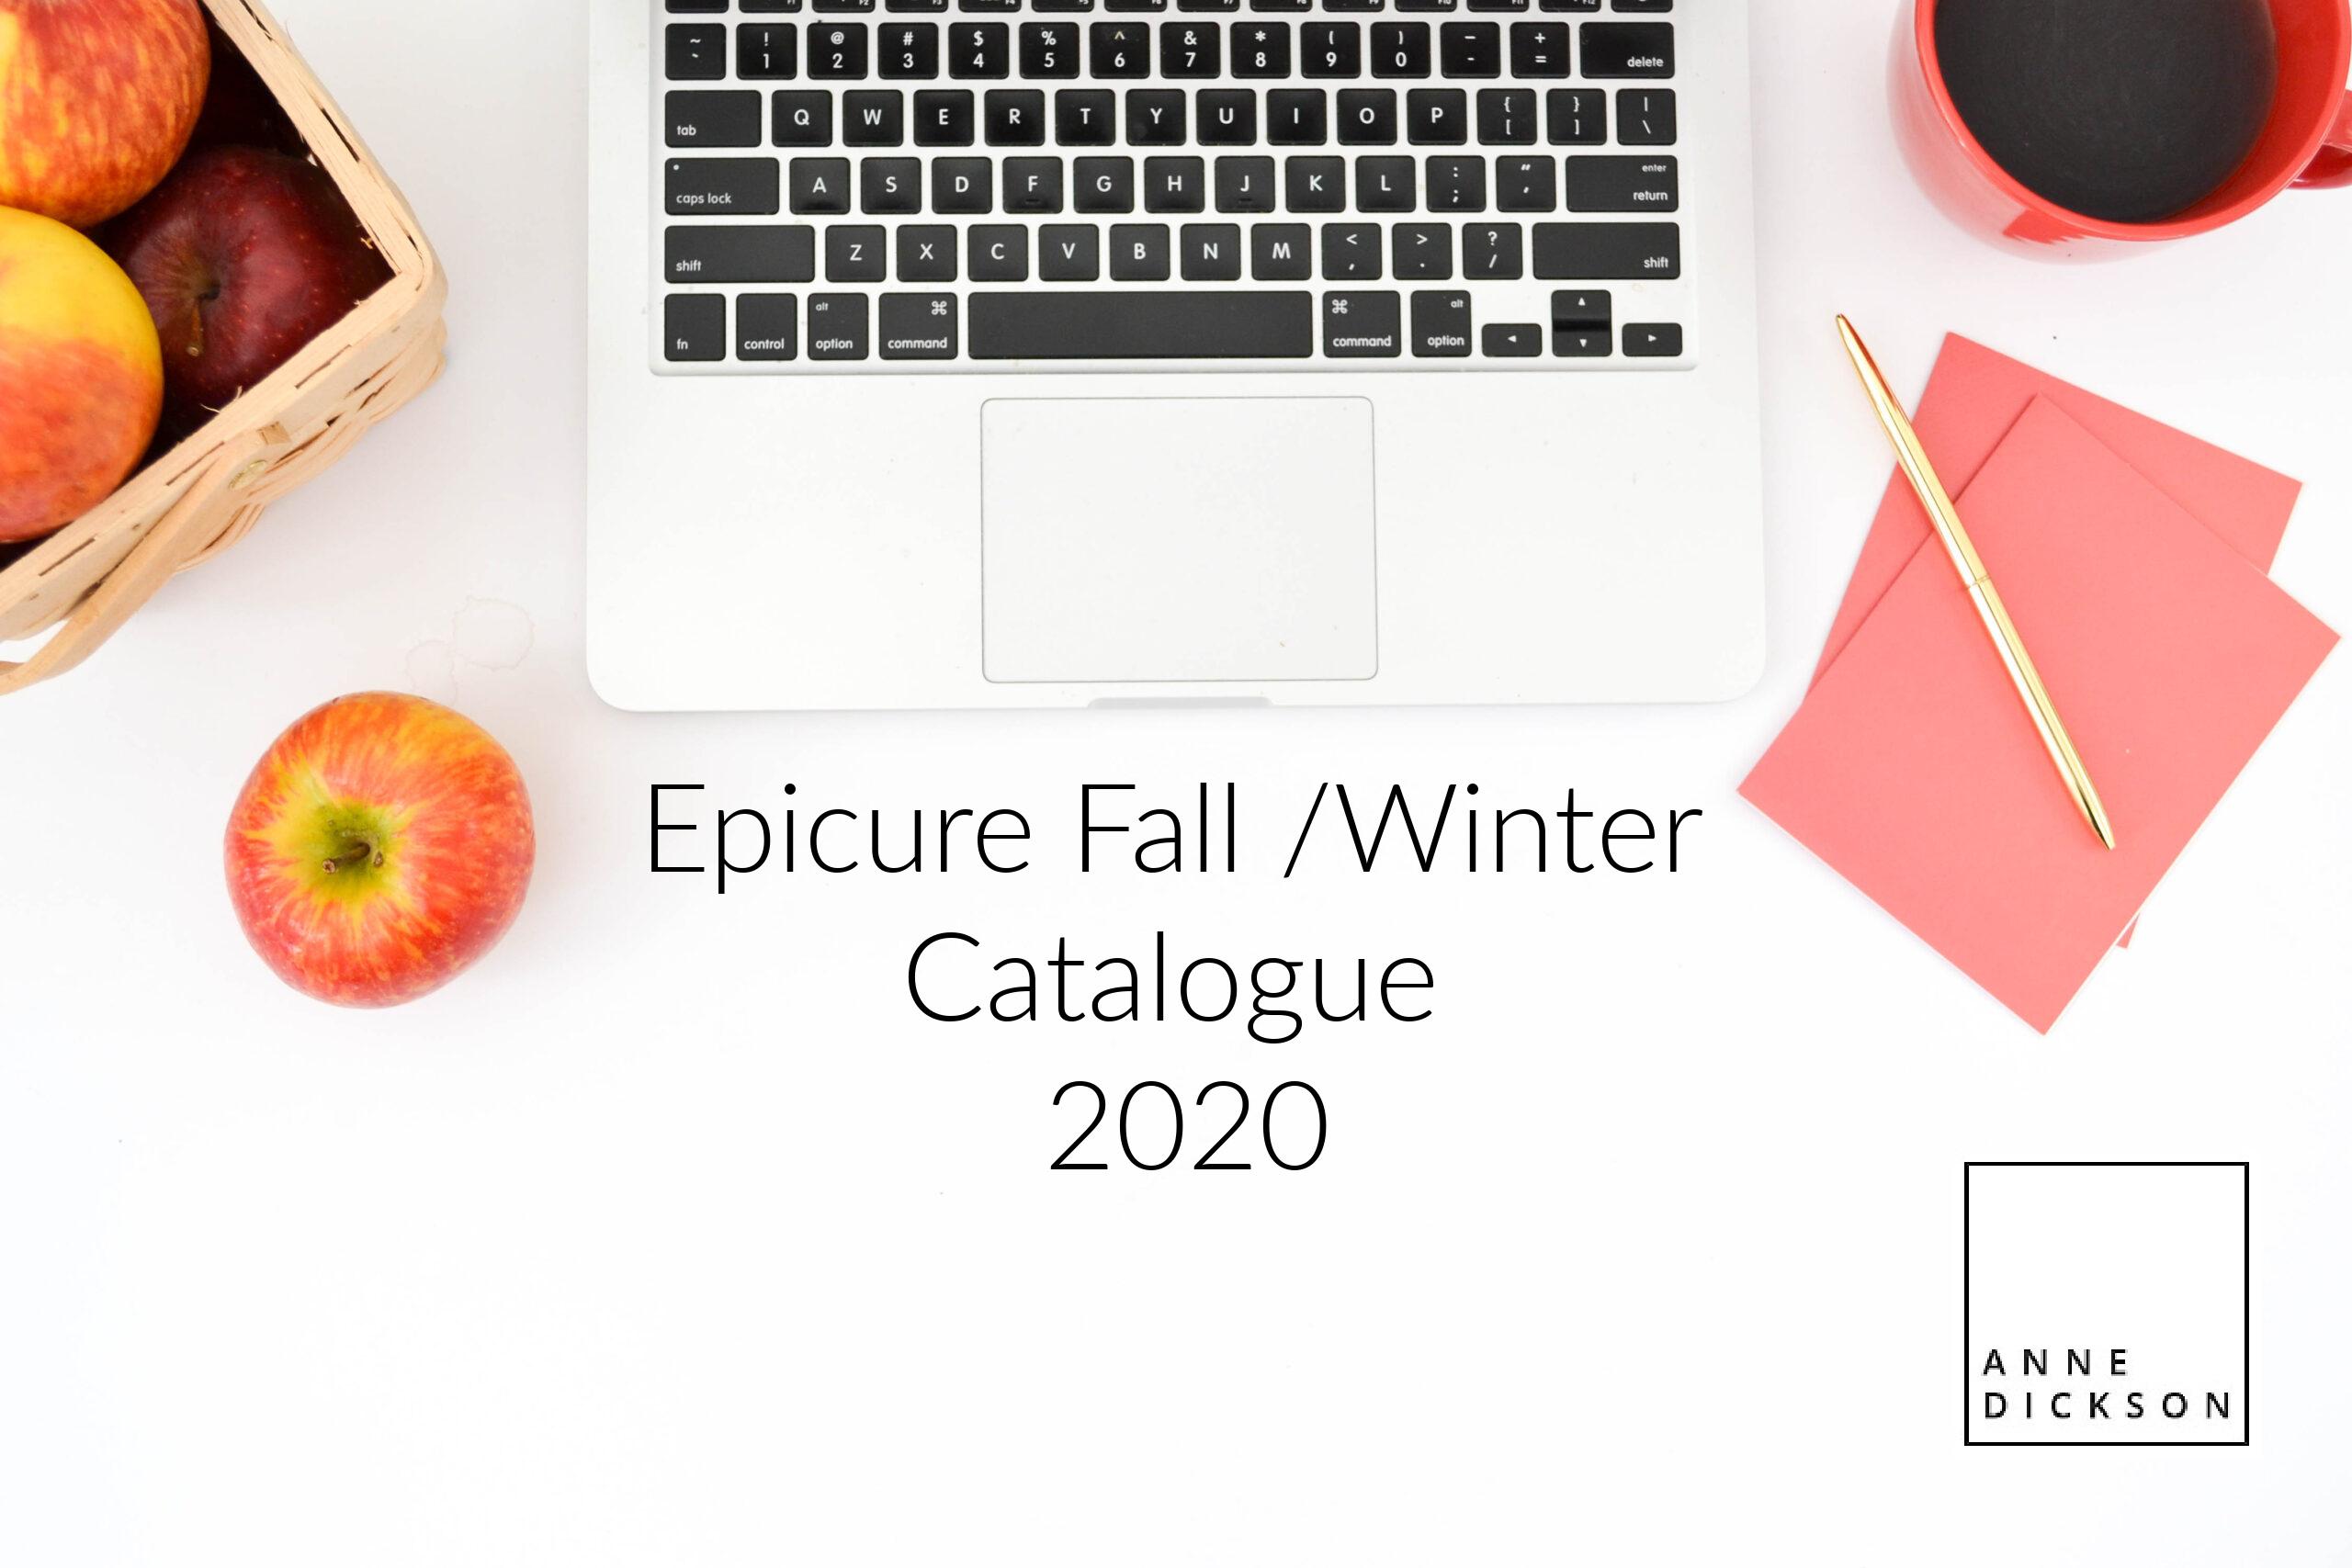 Epicure Fall Catalogue